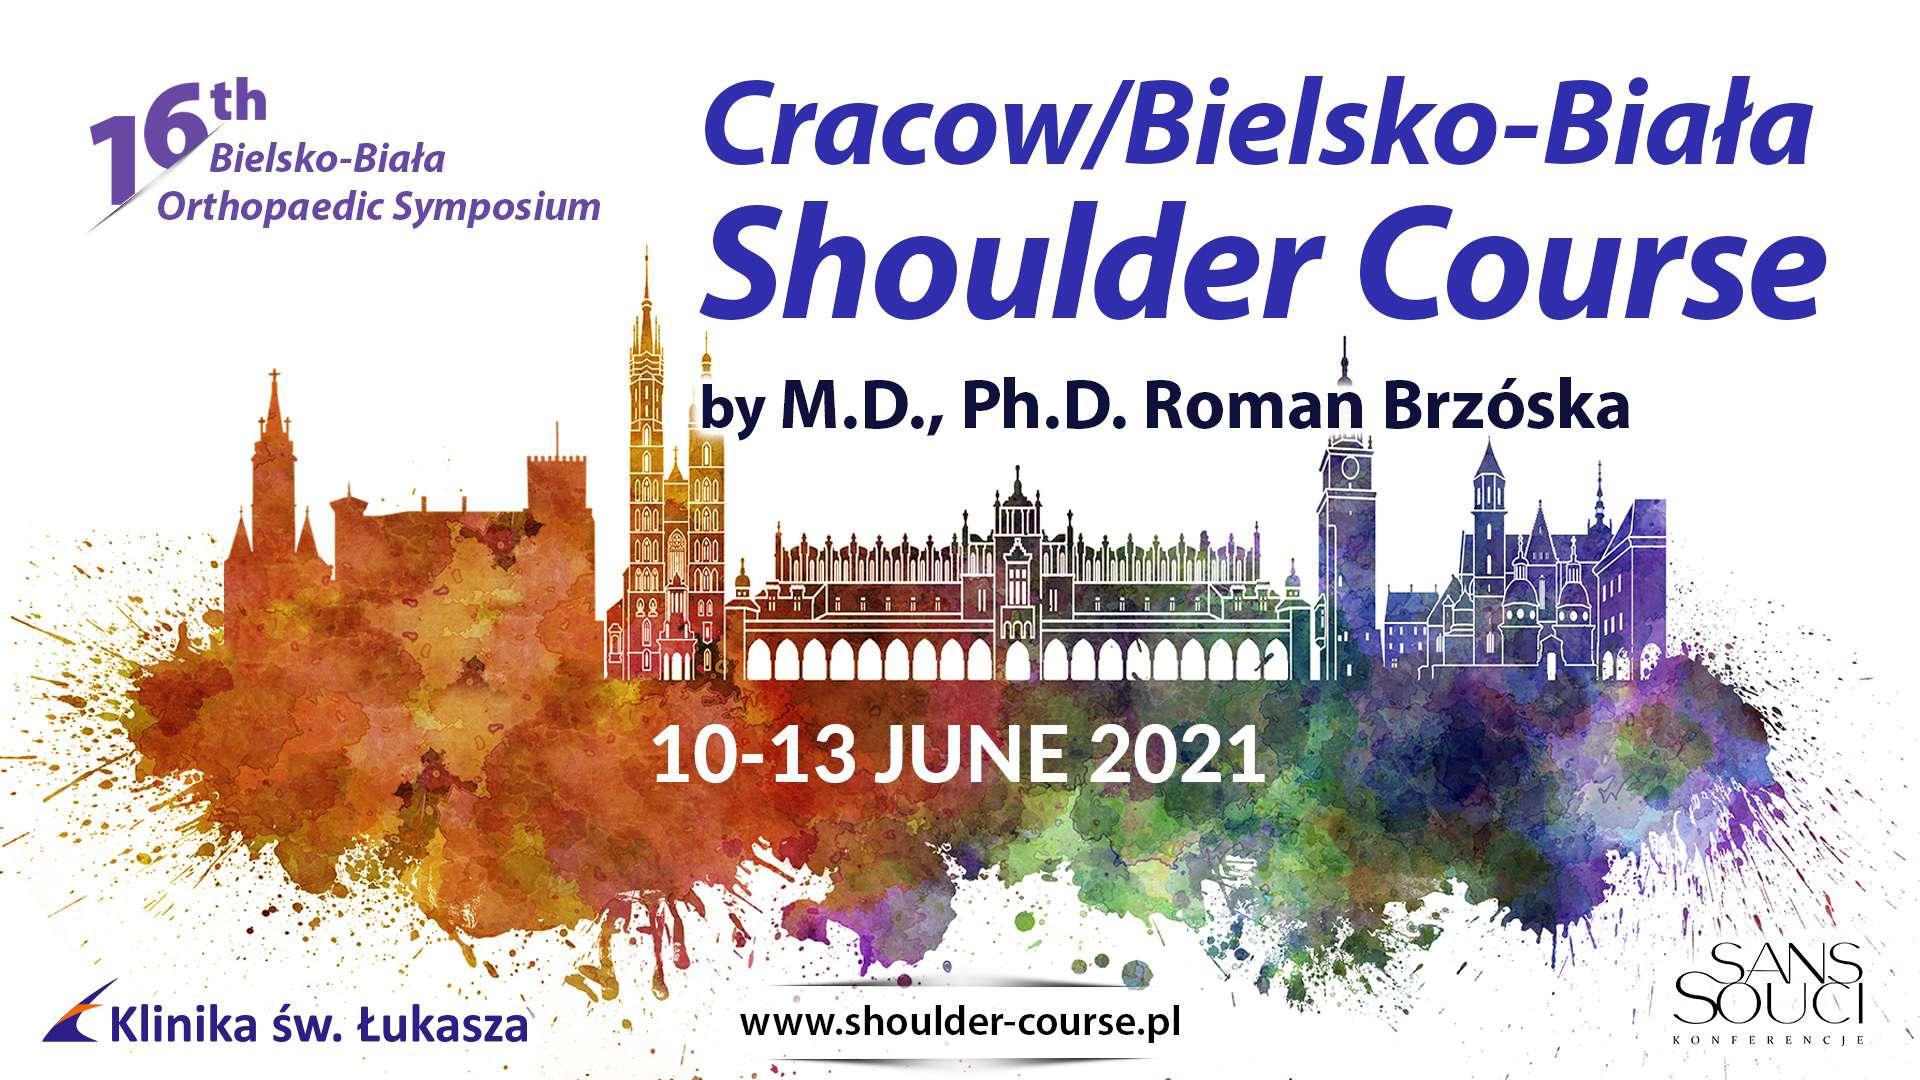 Cracow/Bielsko Biała Shoulder Course/16th Bielsko Biała Orthopaedic Symposium